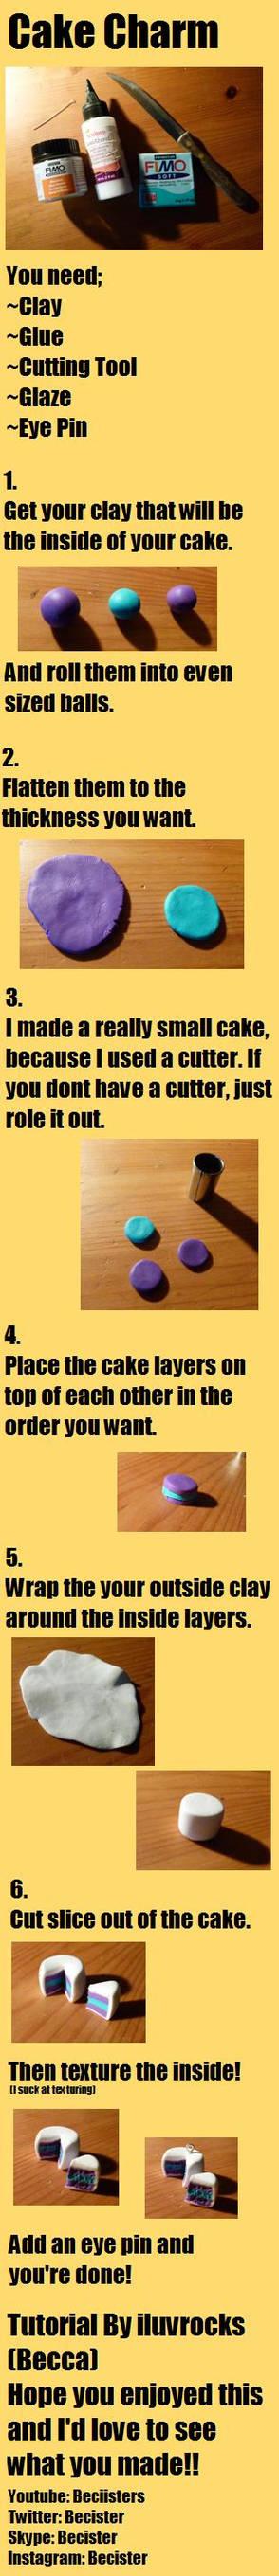 Cake Charm Tutorial